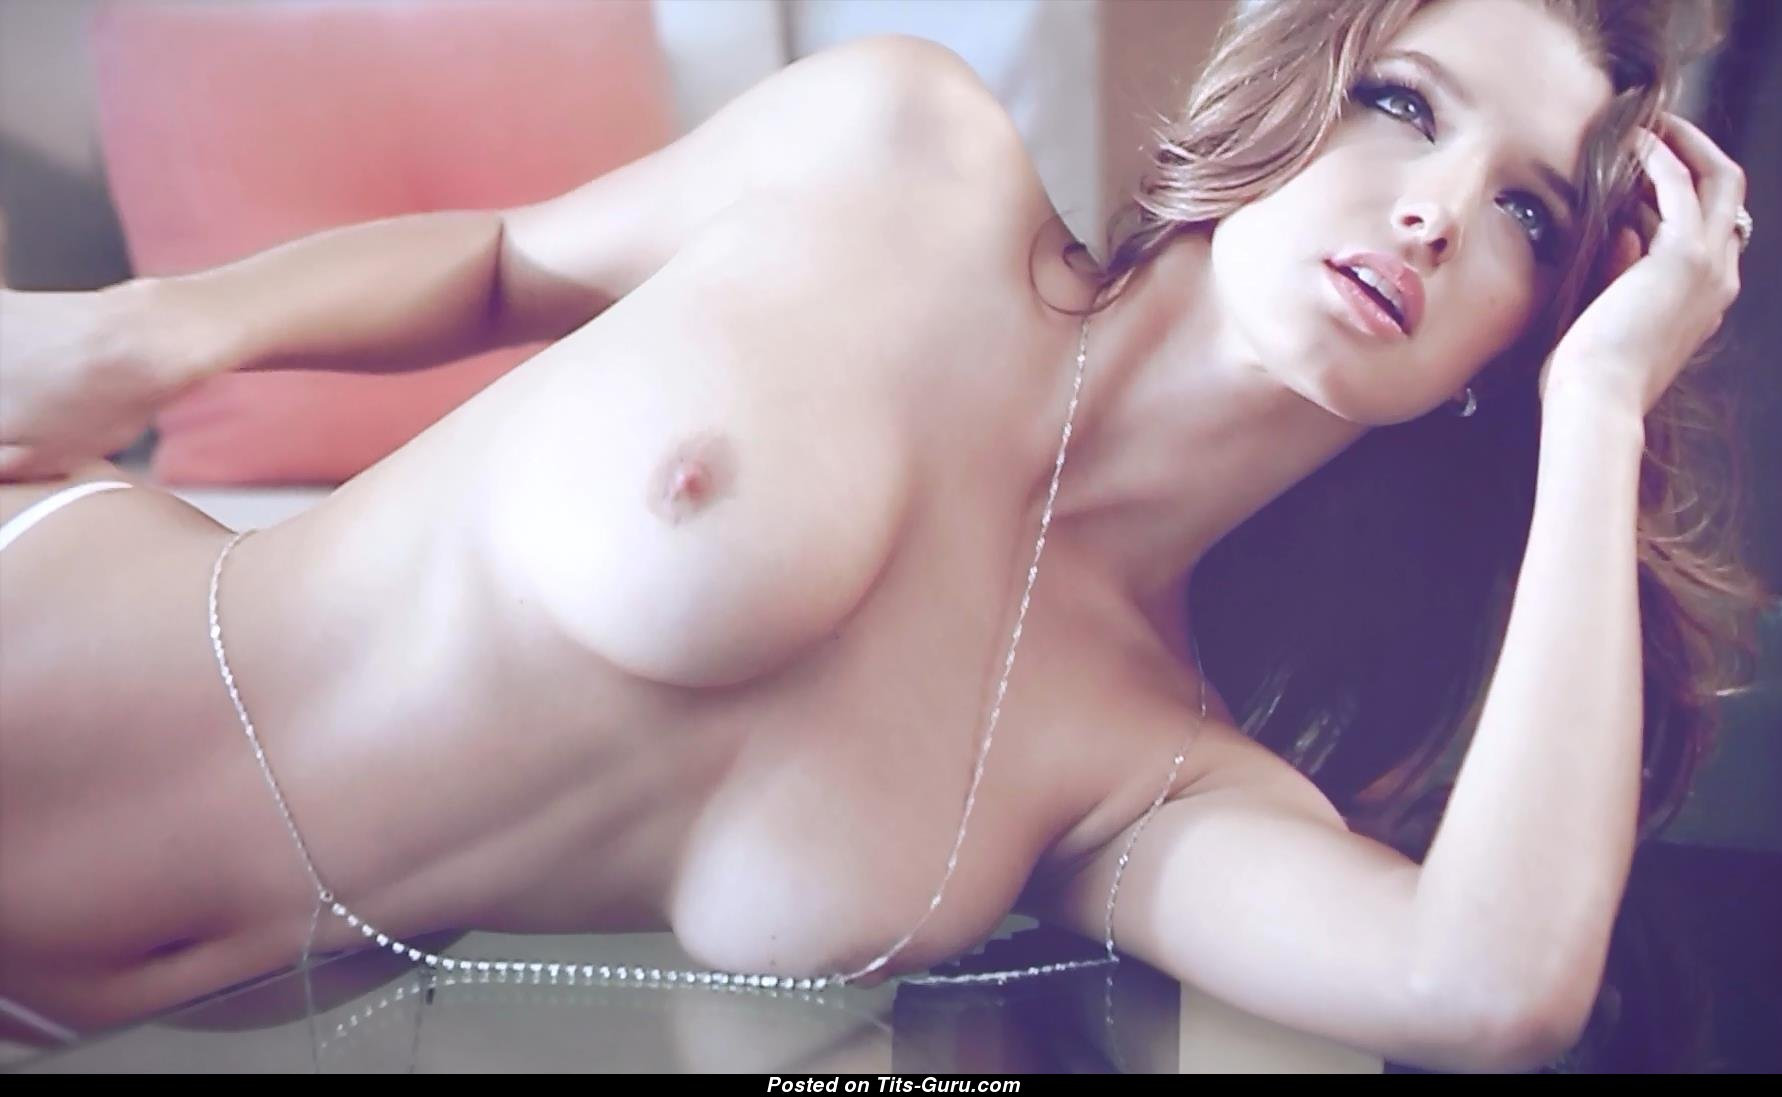 Alyssa Arce Sex alyssa arce - topless latina brunette babe with bare firm